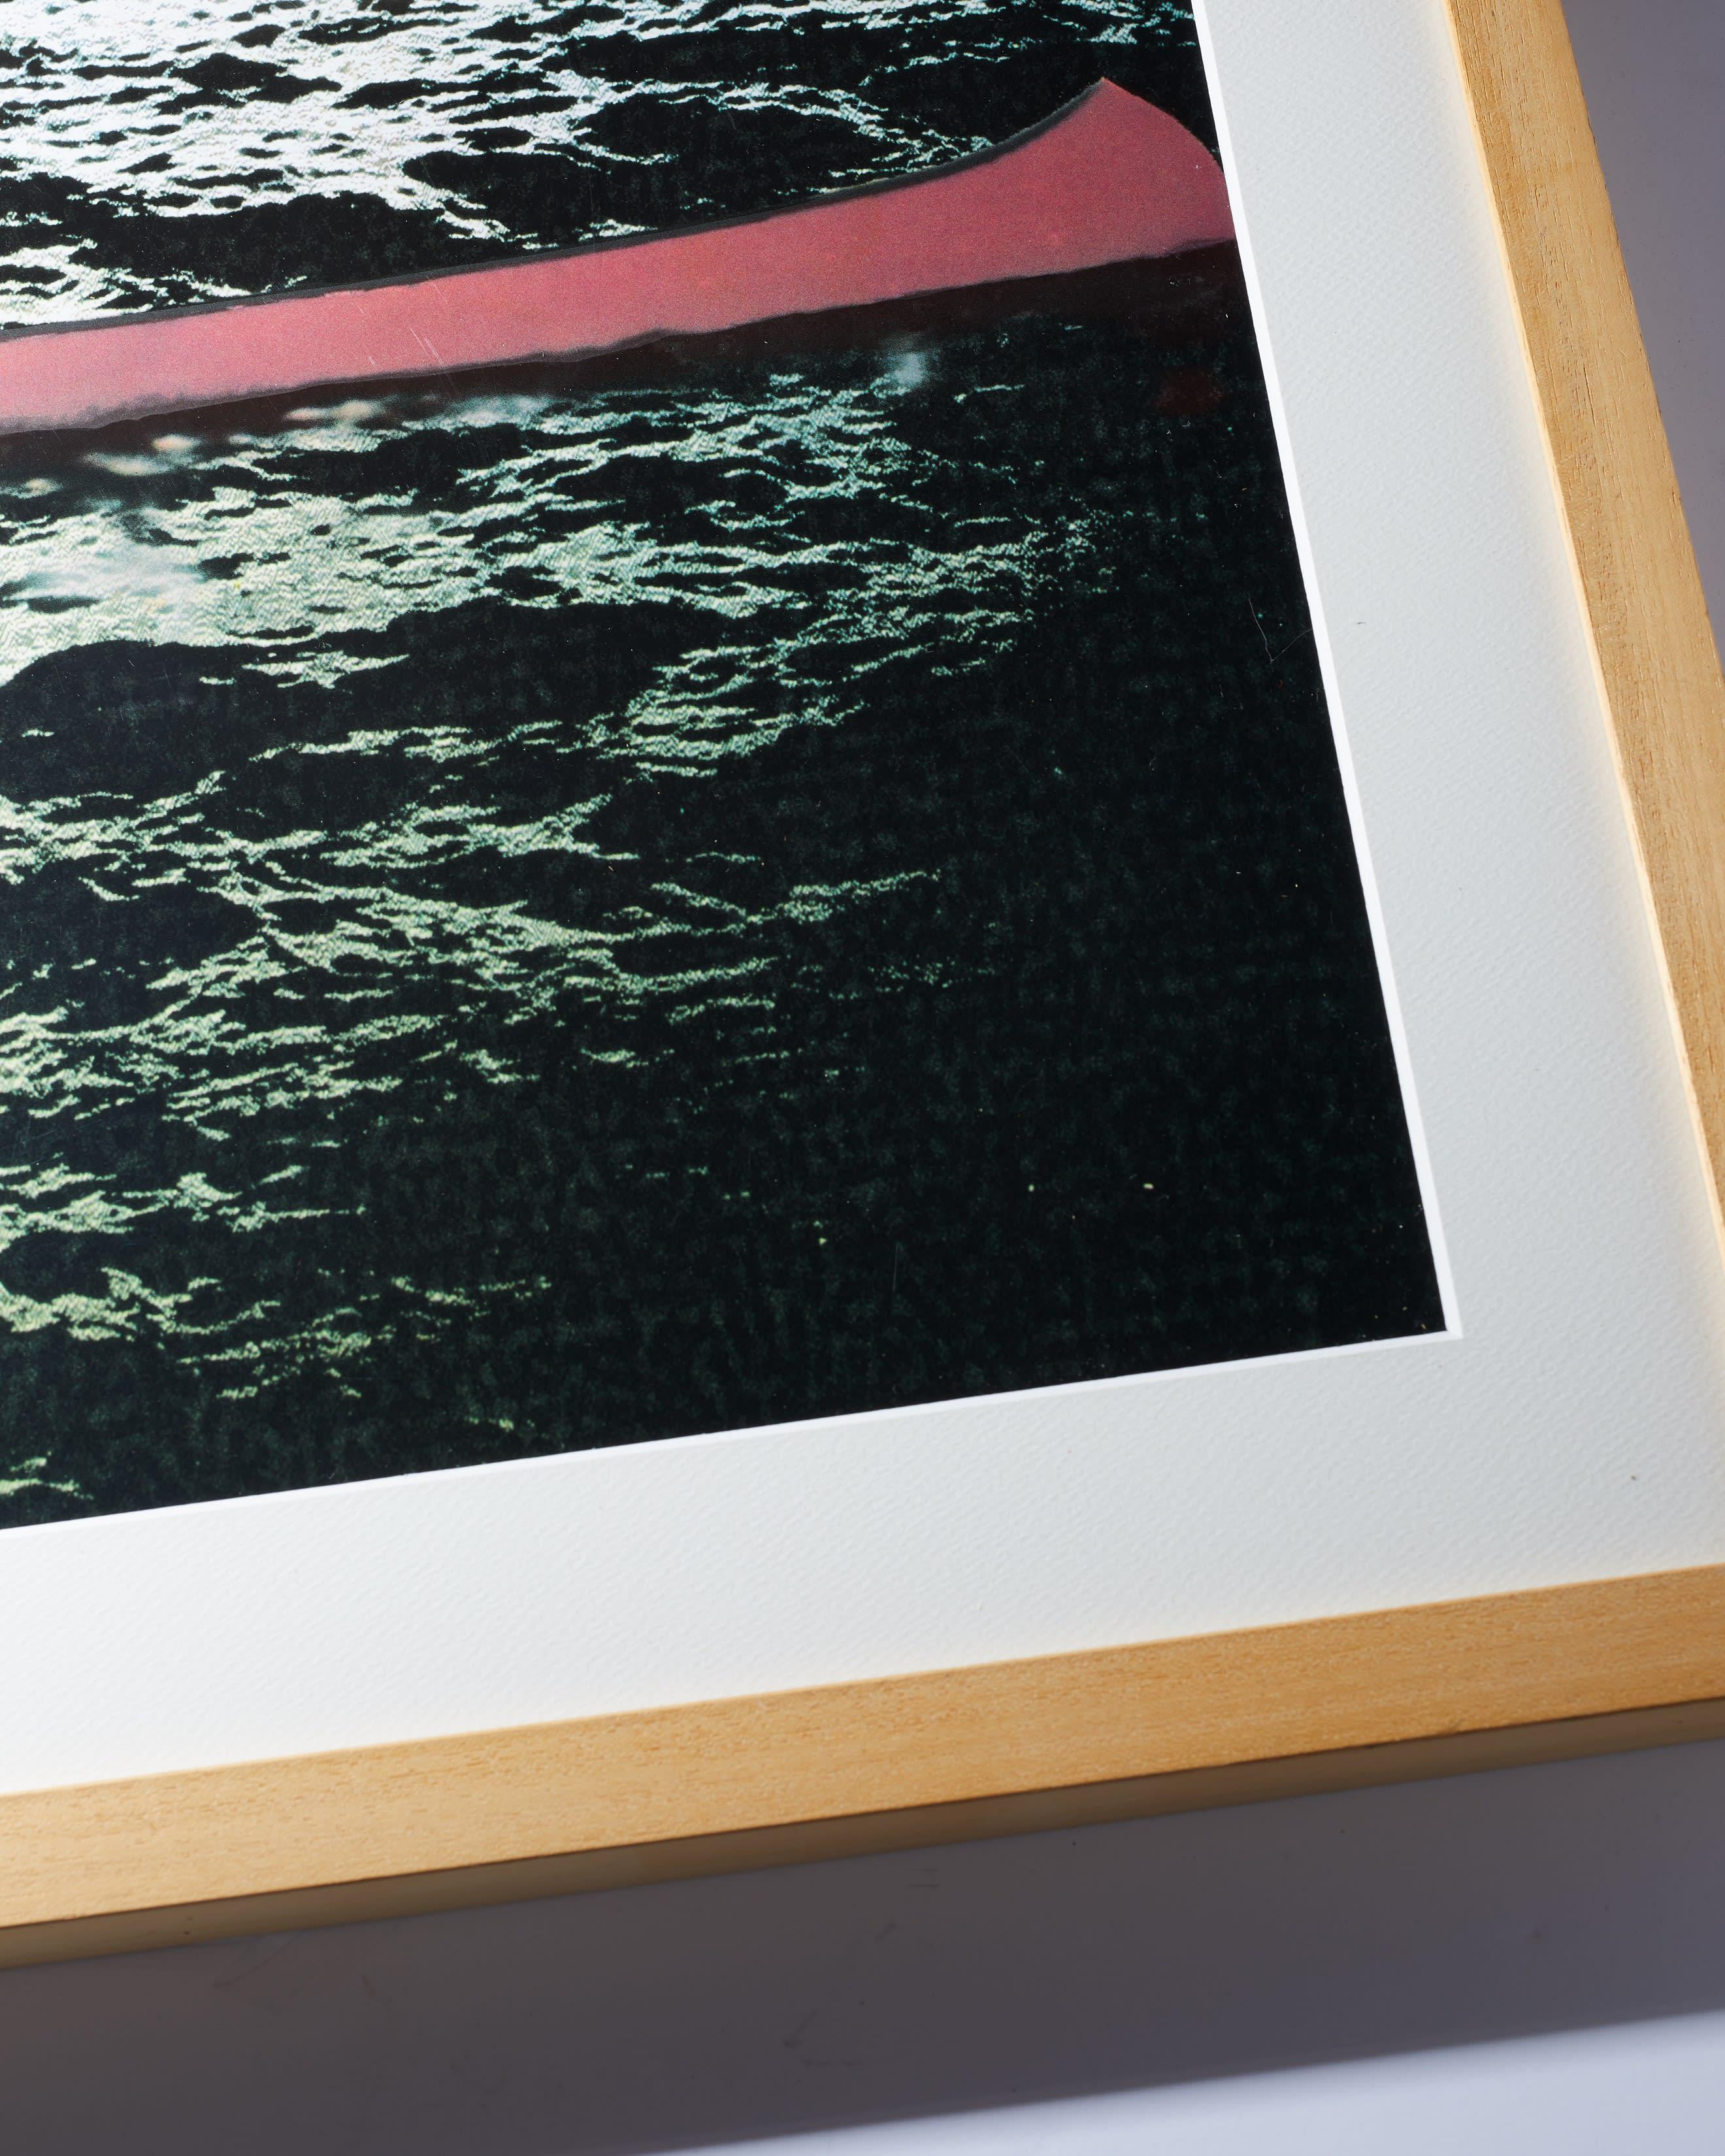 Peter Doig Print- Canoe Island- Zane Bennett Contemporary Art